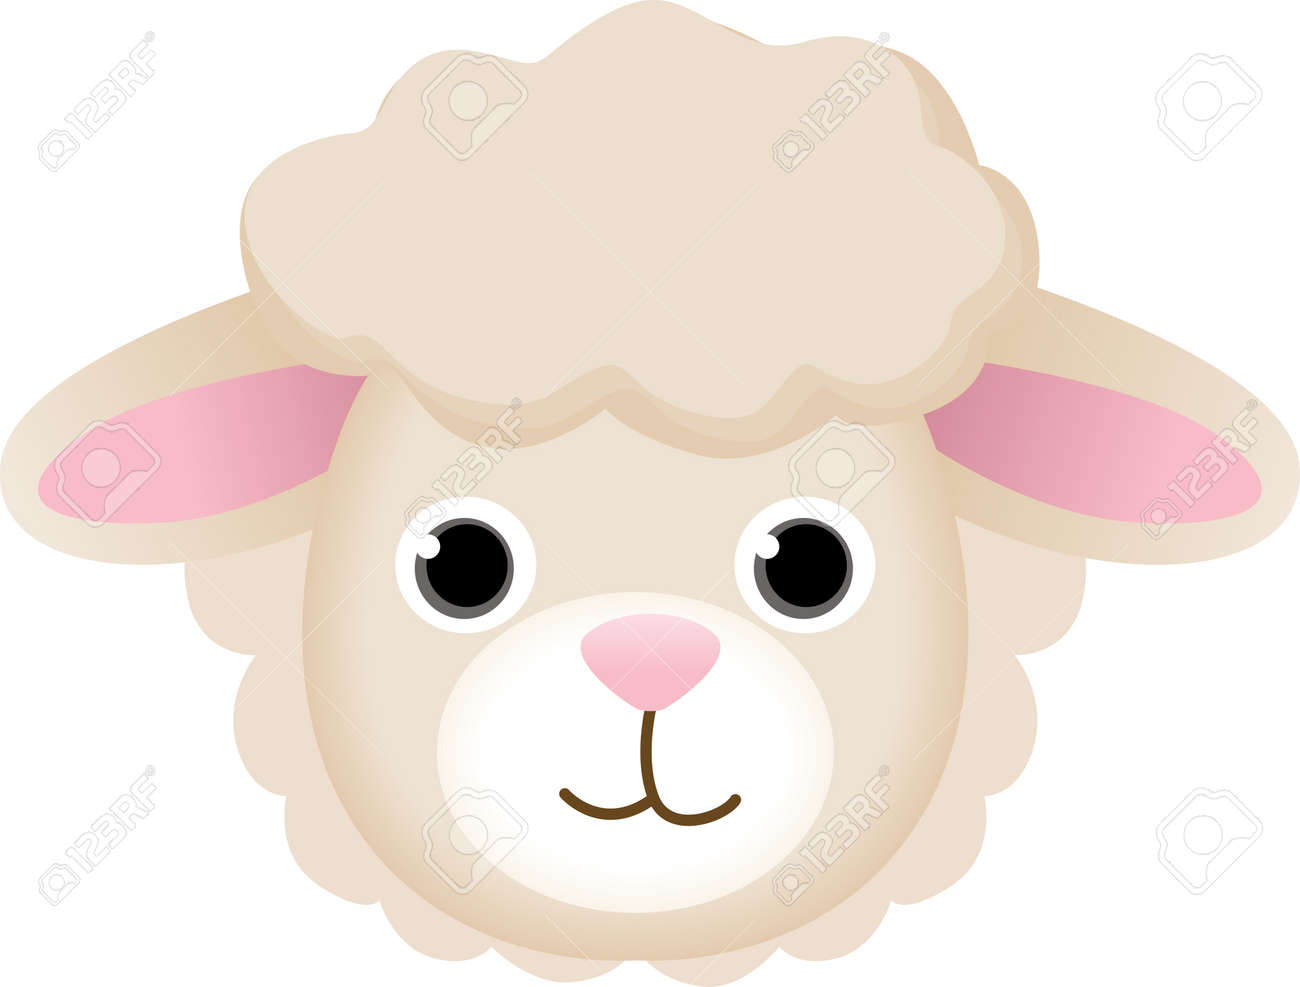 Sheep Face Royalty Free Cliparts, Vectors, And Stock Illustration ...